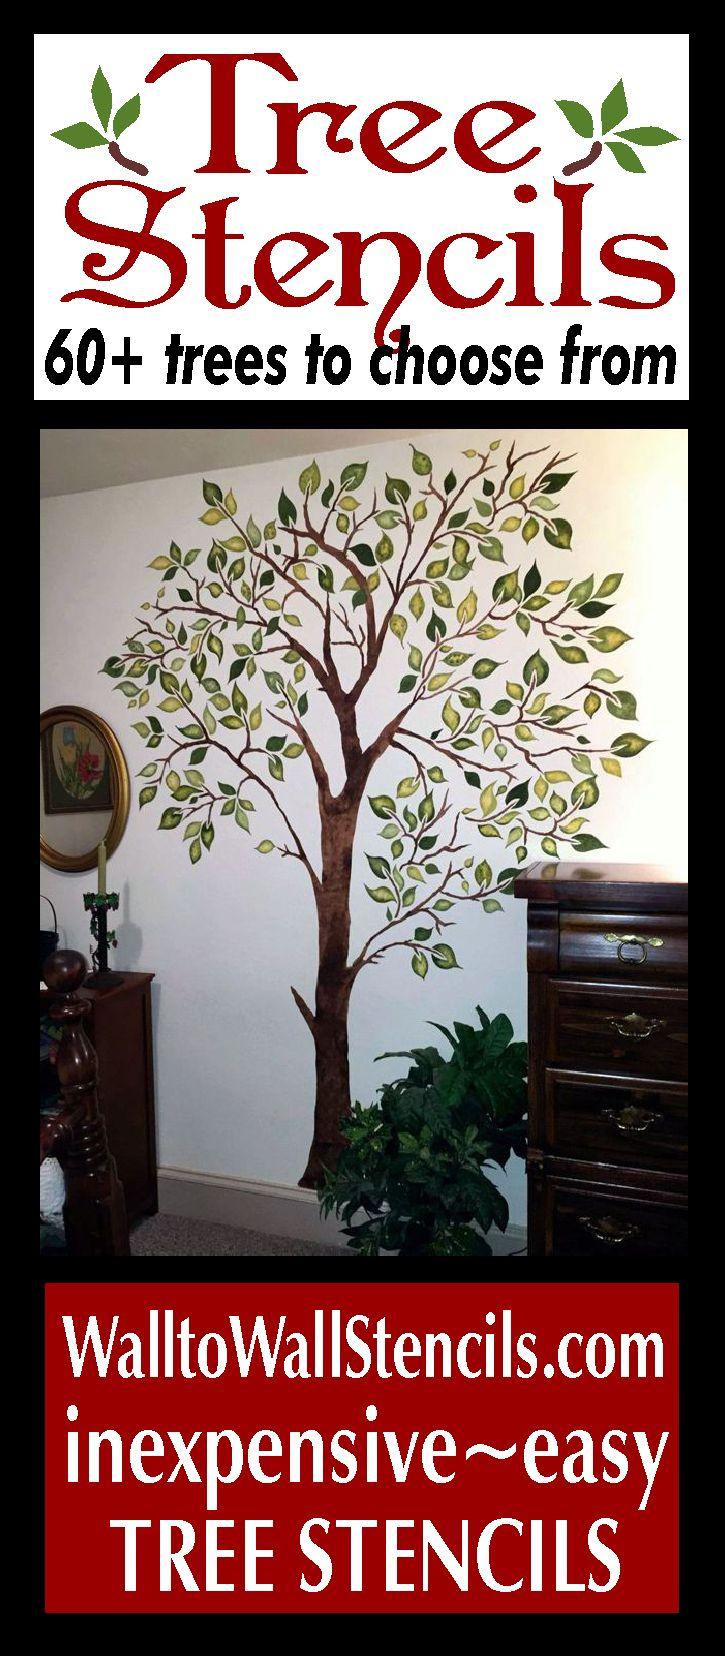 25 unique tree stencil ideas on pinterest cut canvas tree tree stencils from wall to wall stencils amipublicfo Gallery